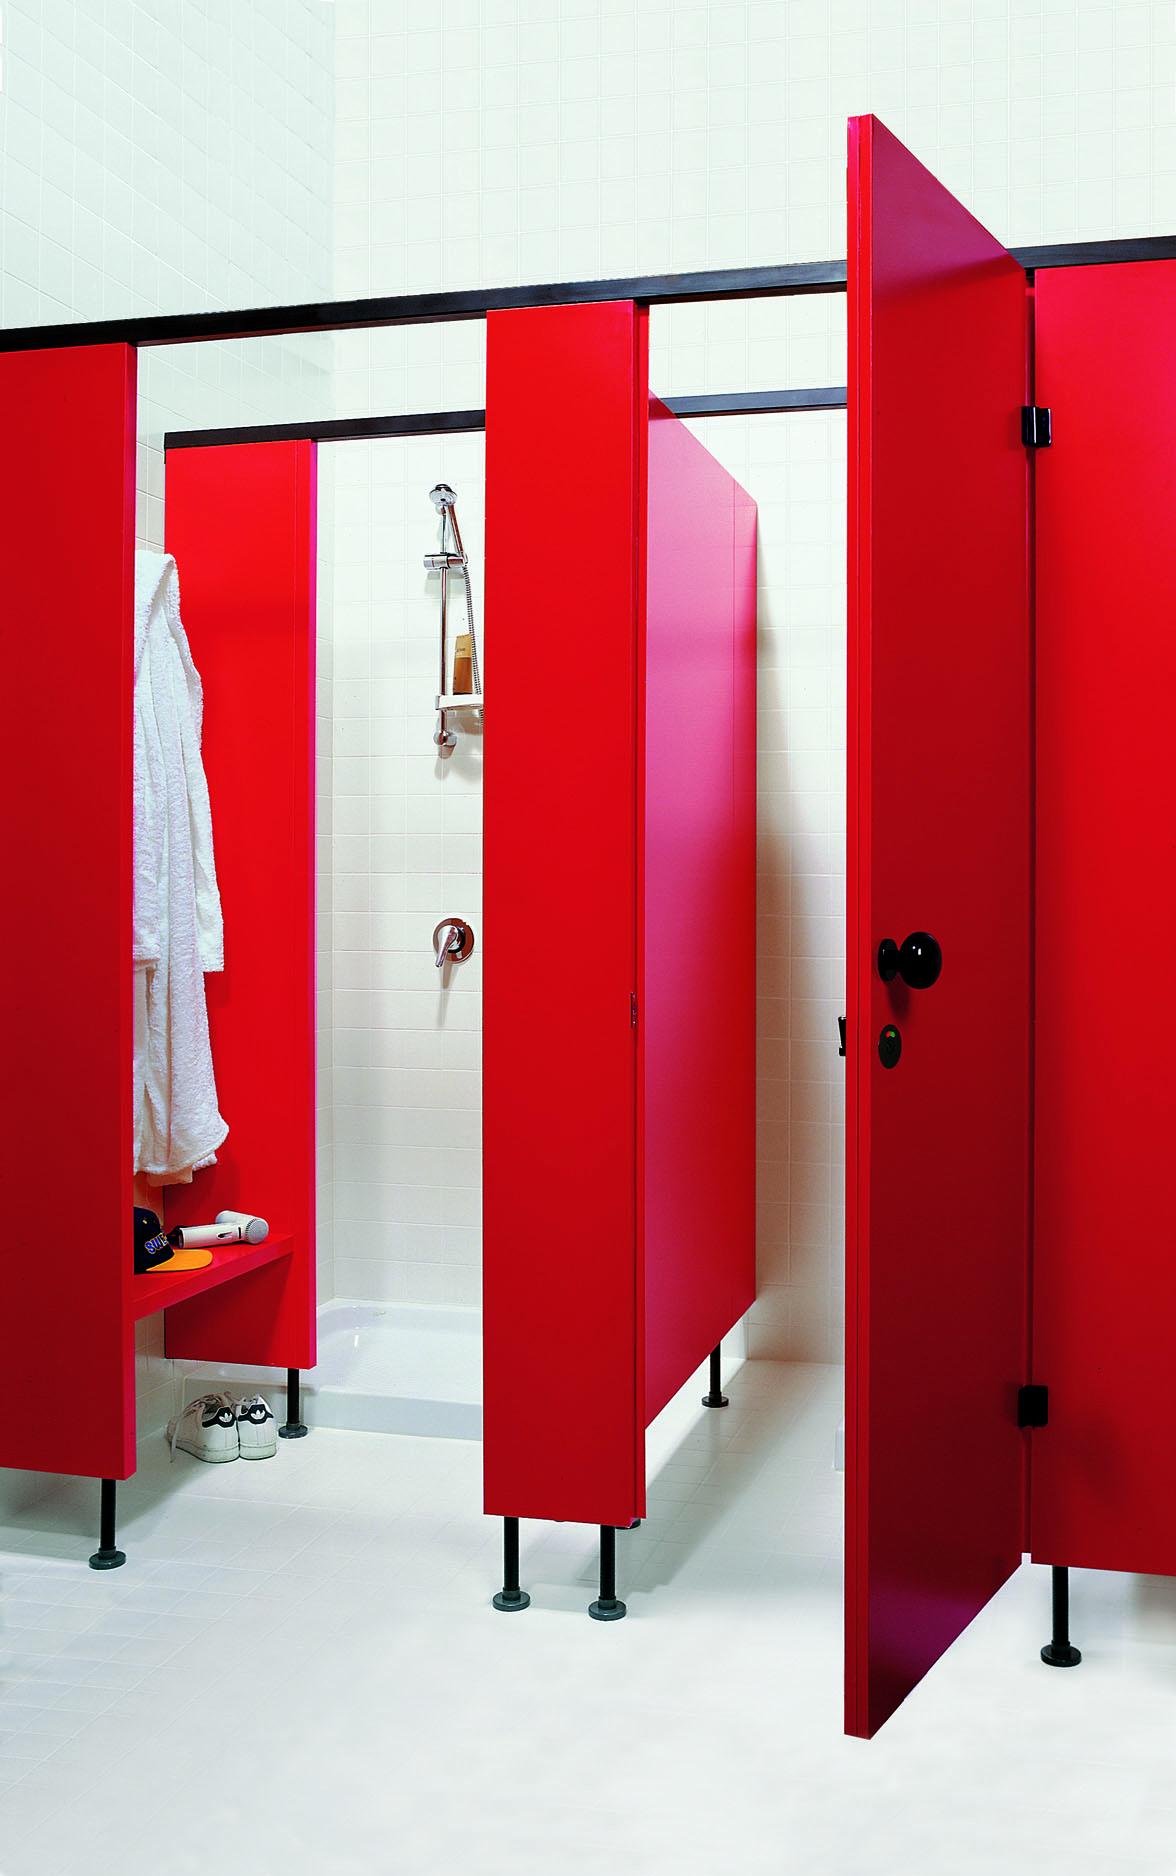 Bagni prefabbricati: la soluzione di Ala Rational System per hotel ...